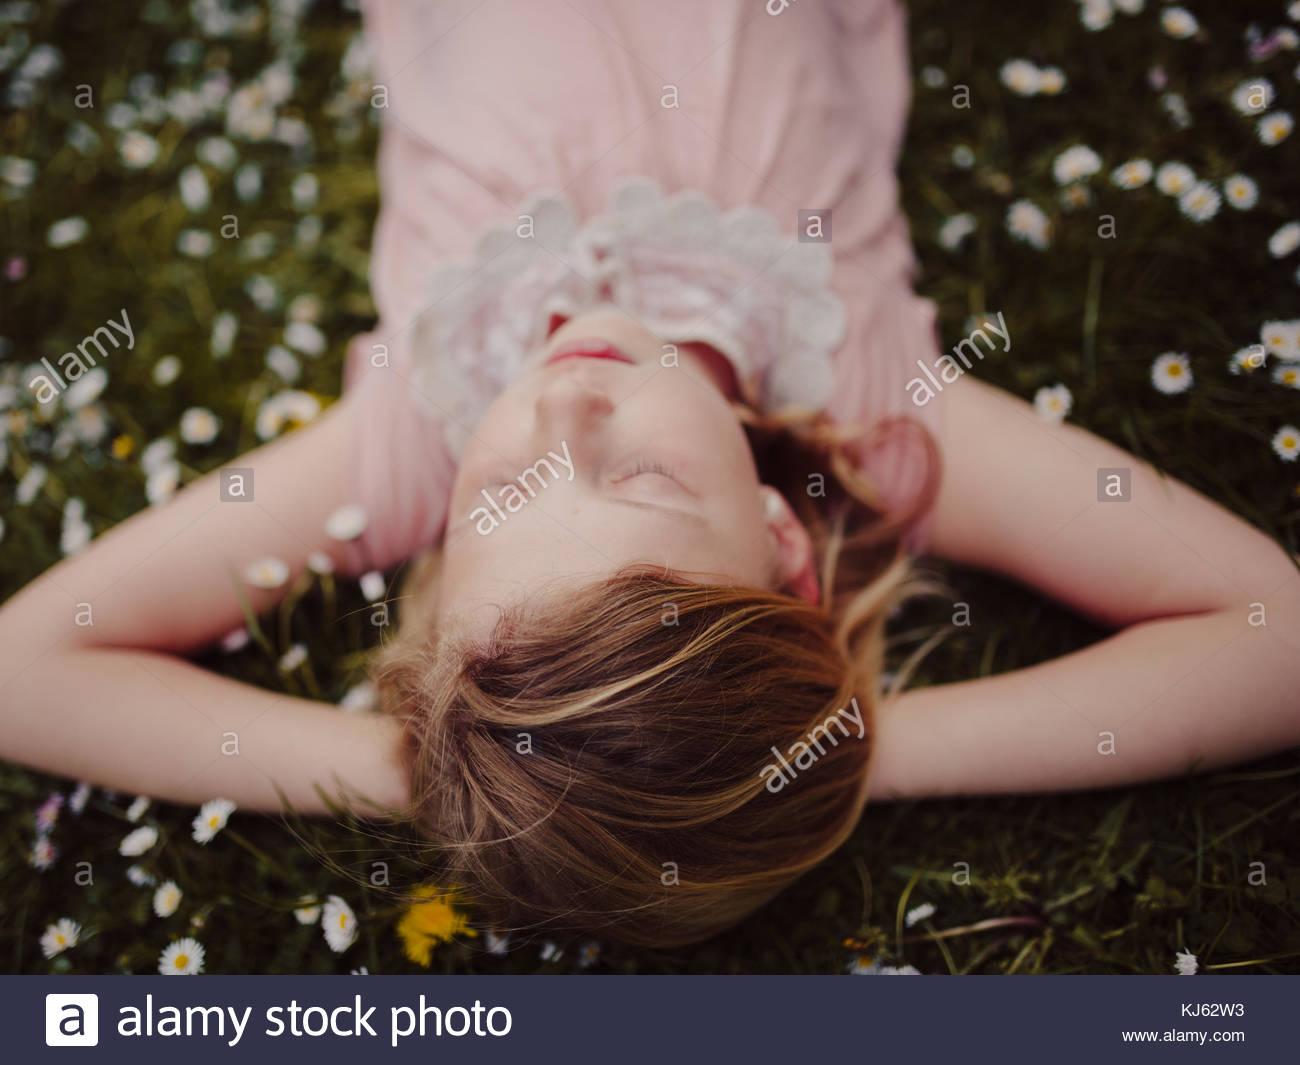 Jeune fille en robe rose pose dans l'herbe Photo Stock